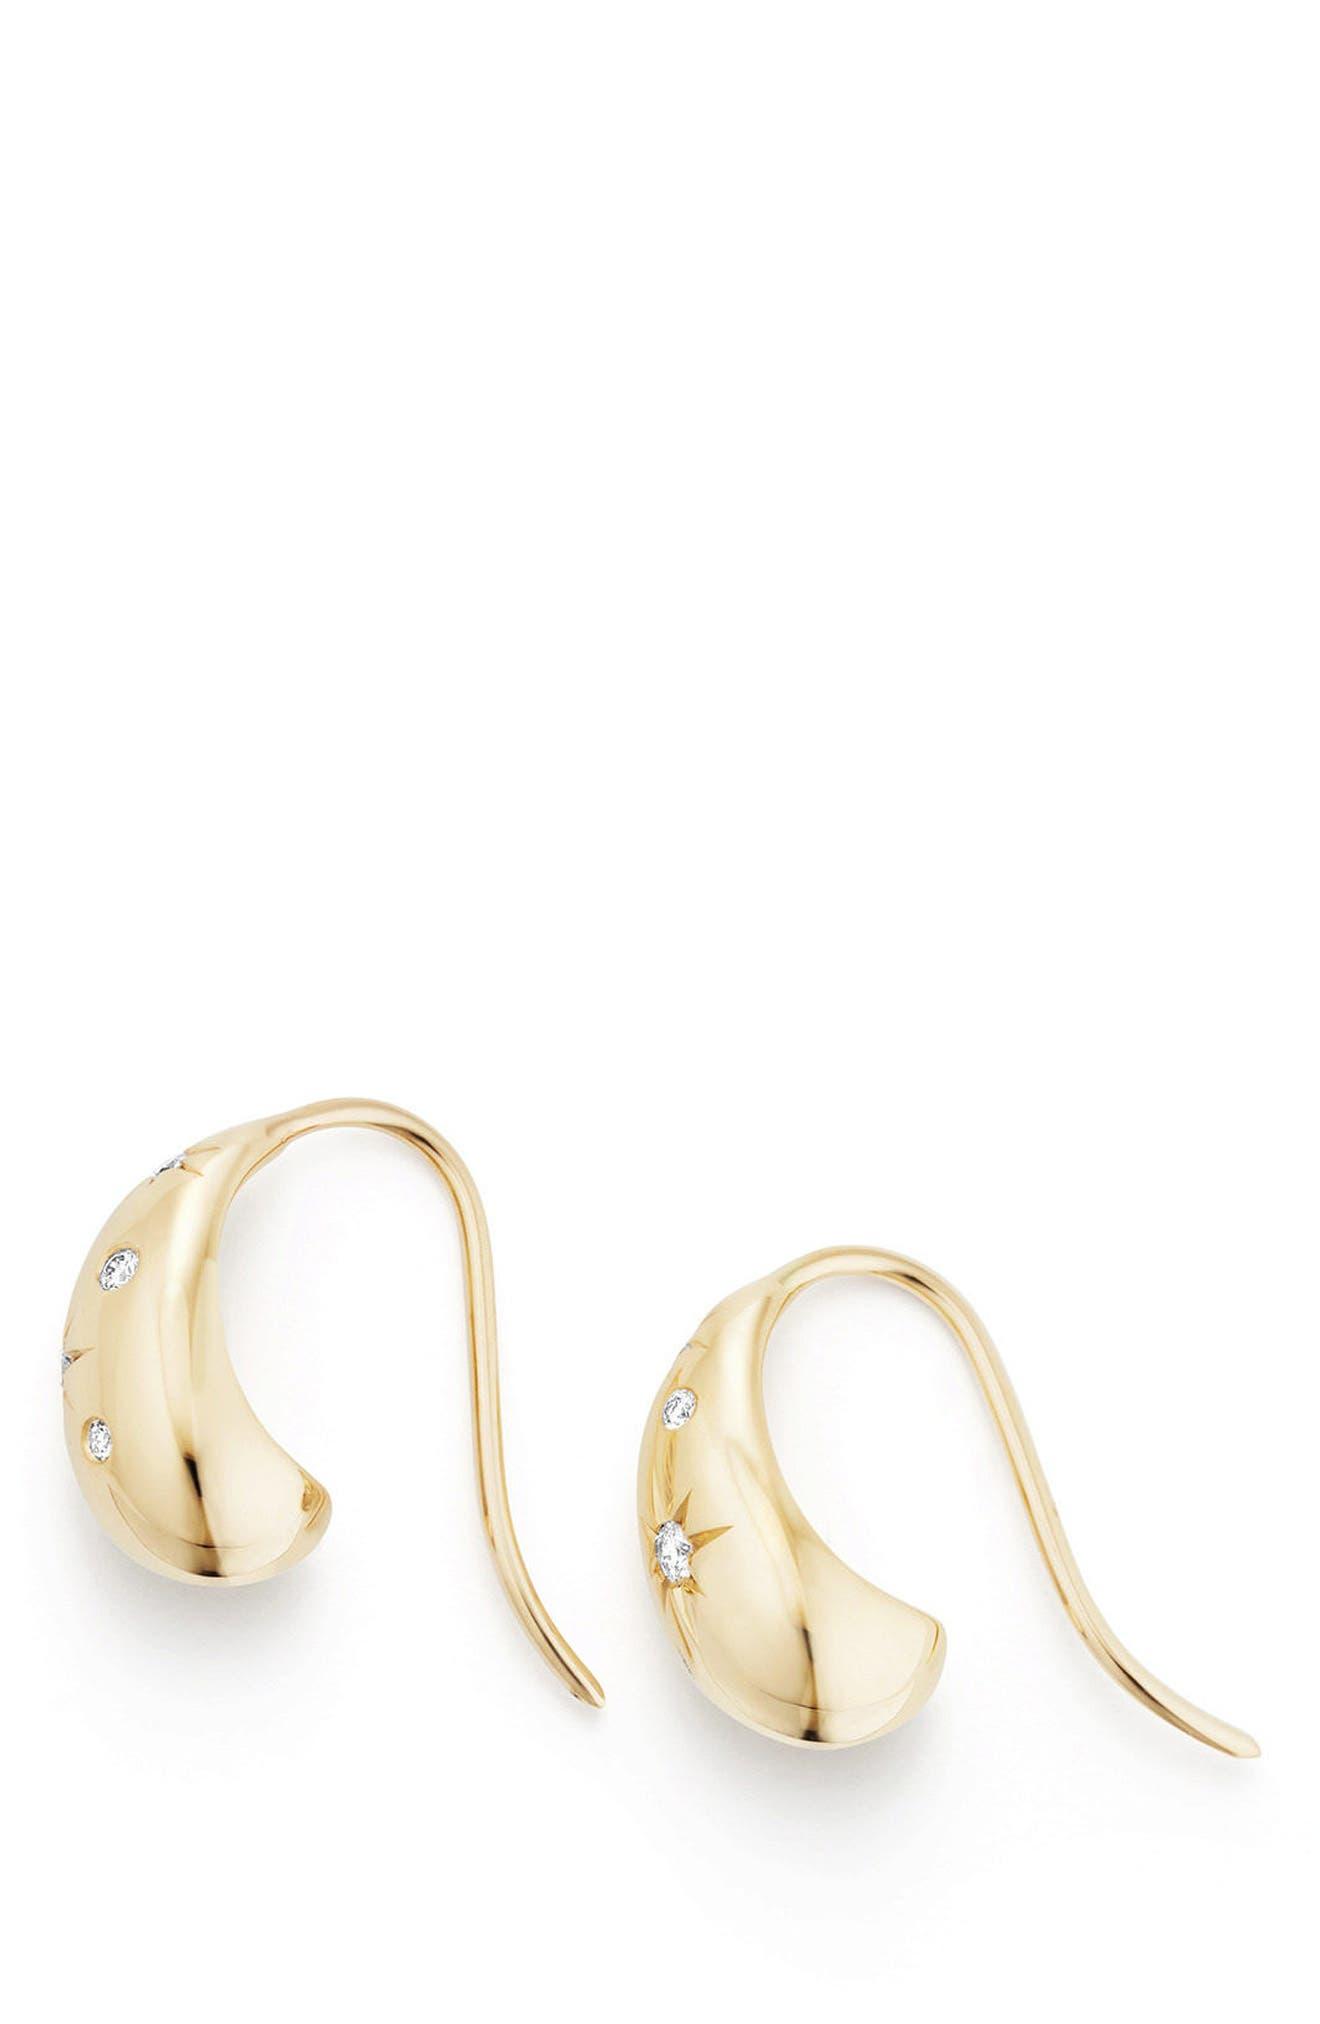 Alternate Image 2  - David Yurman Pure Form Pod Earrings with Diamonds in 18K Gold, 15mm